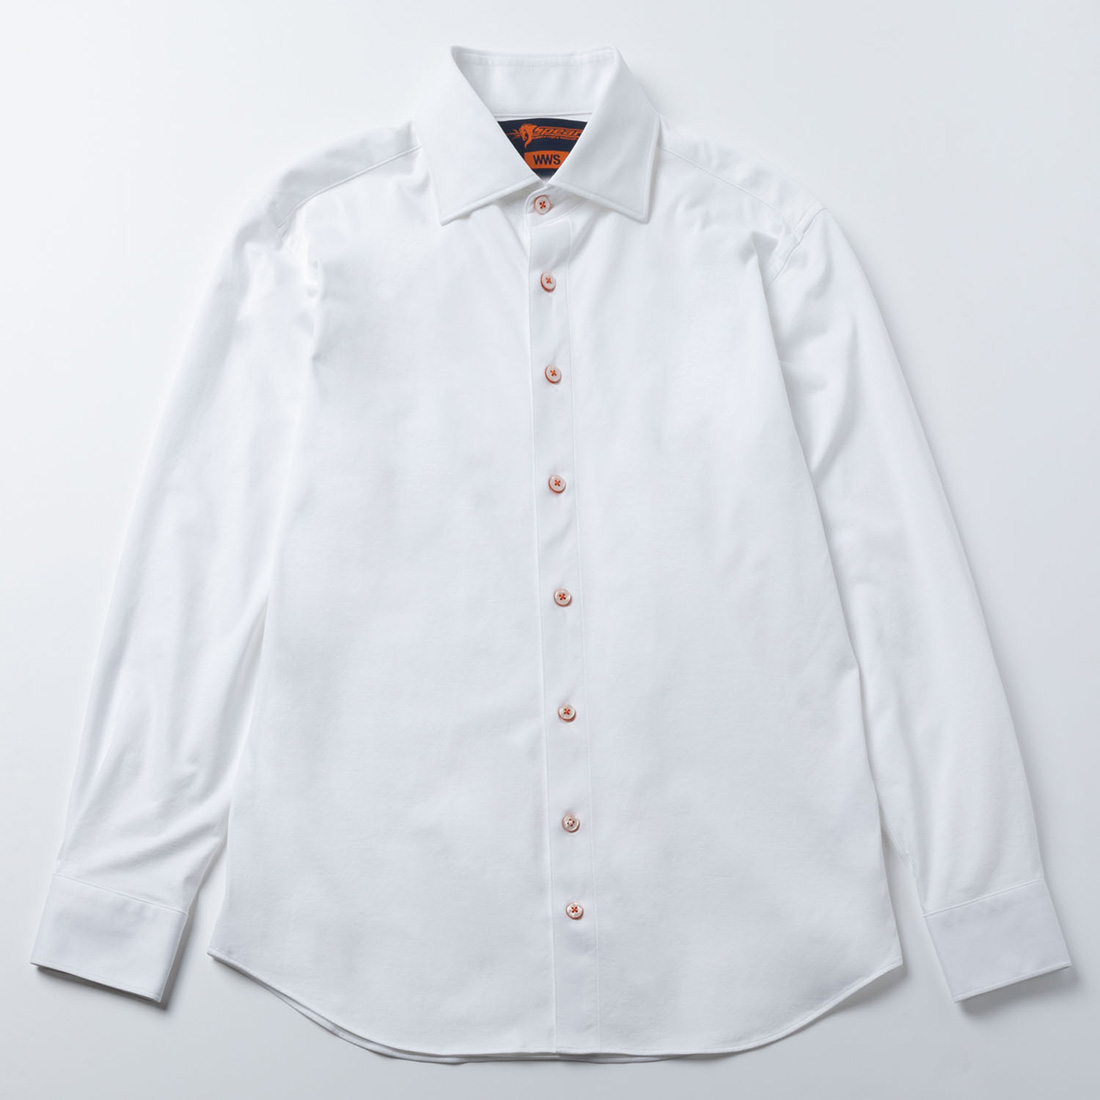 WWS×クボタスピアーズ船橋・東京ベイオフィシャルワイシャツ